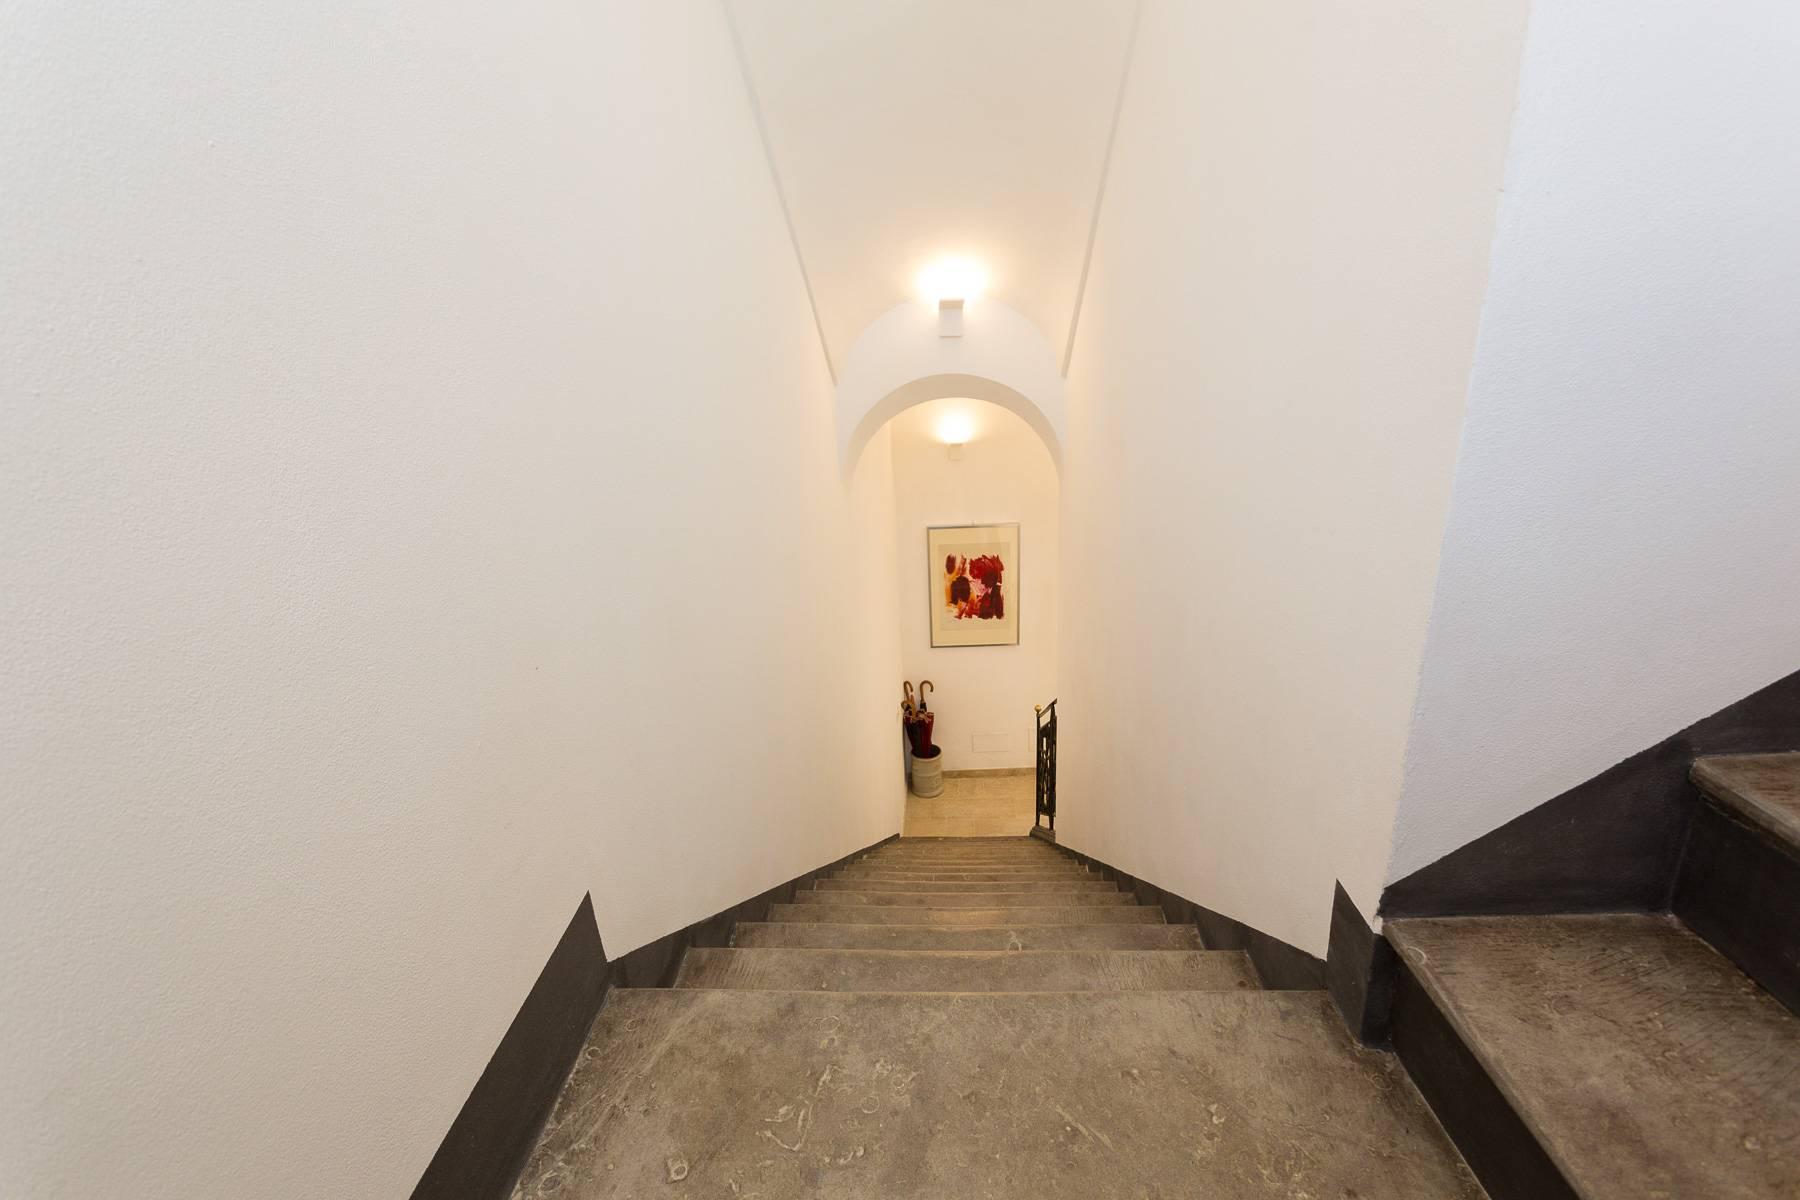 Casa indipendente in Vendita a Noto: 5 locali, 171 mq - Foto 10